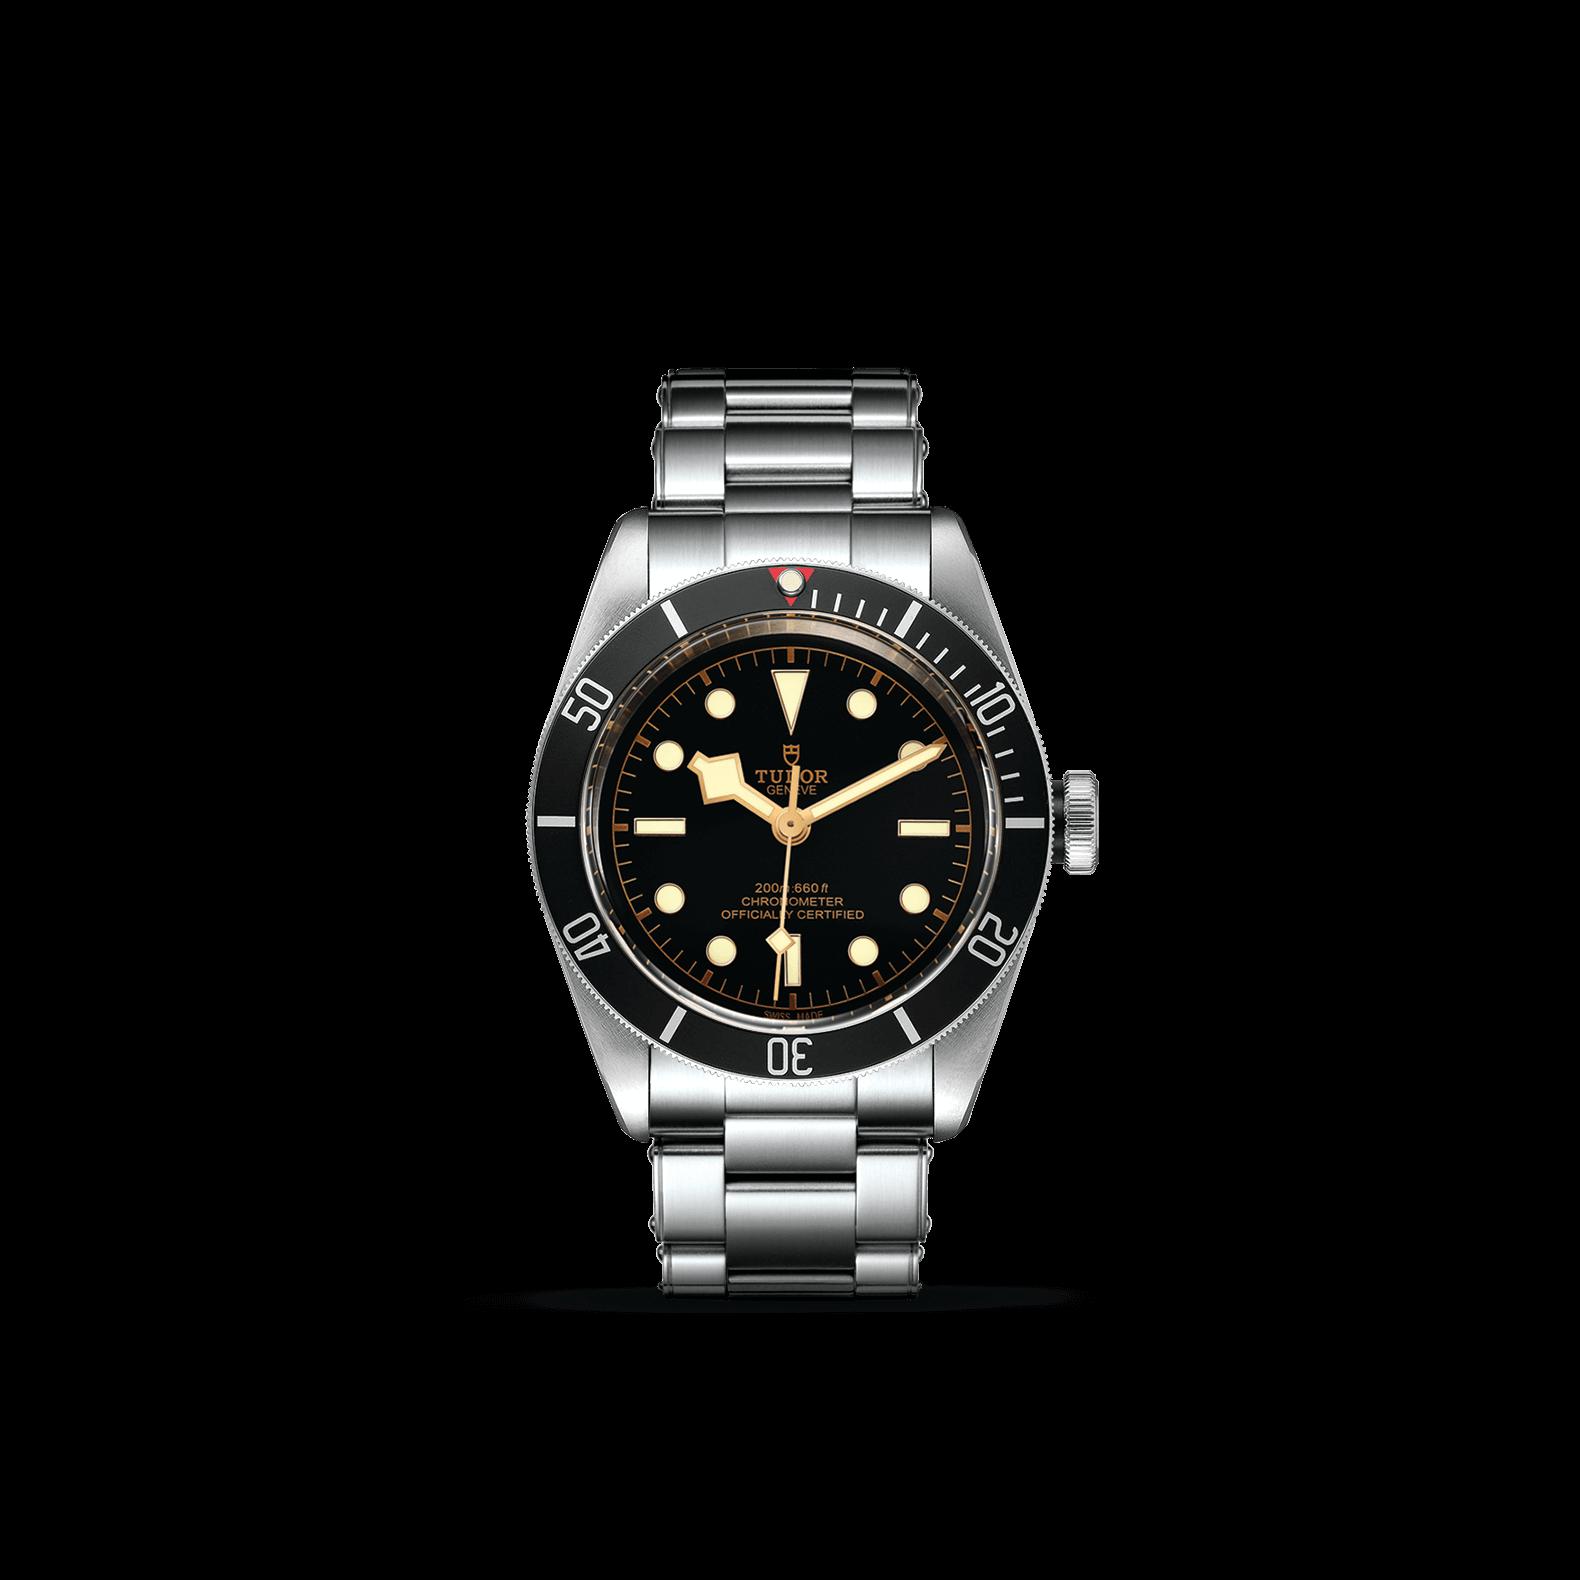 Tudor_M79230n-0009